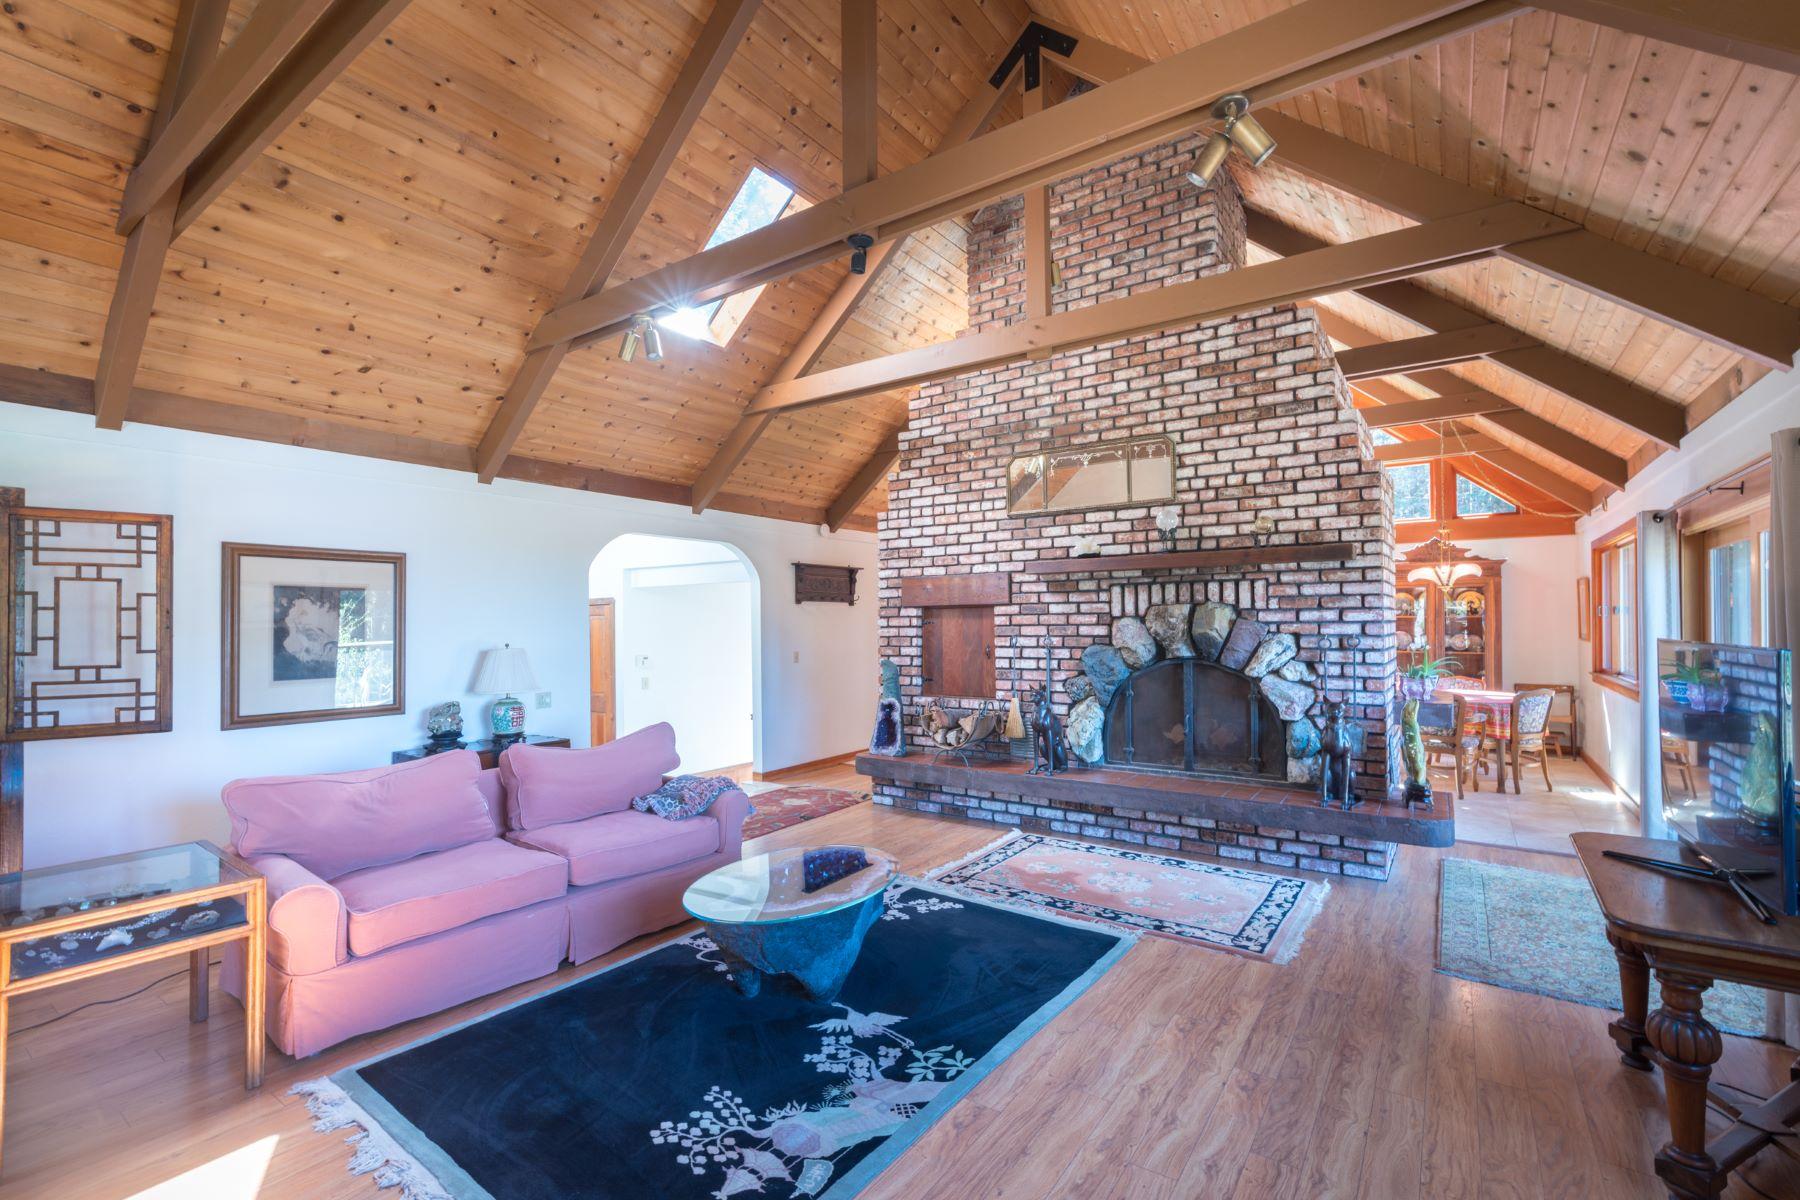 Additional photo for property listing at Inglenook Equestrian Elegance 26261 Omar Drive Fort Bragg, California 95437 Estados Unidos